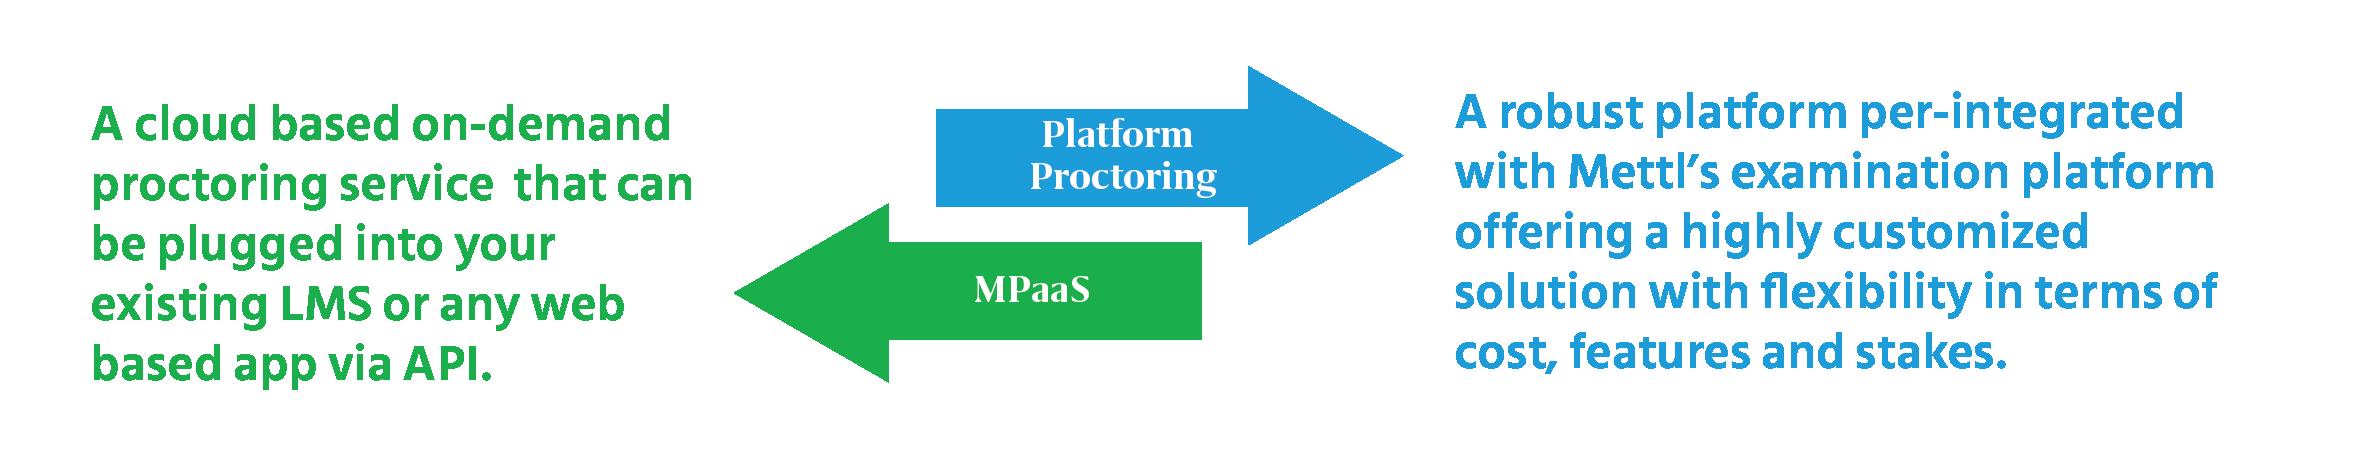 Platform_Proctoring_MPaaS_online_proctoring_services